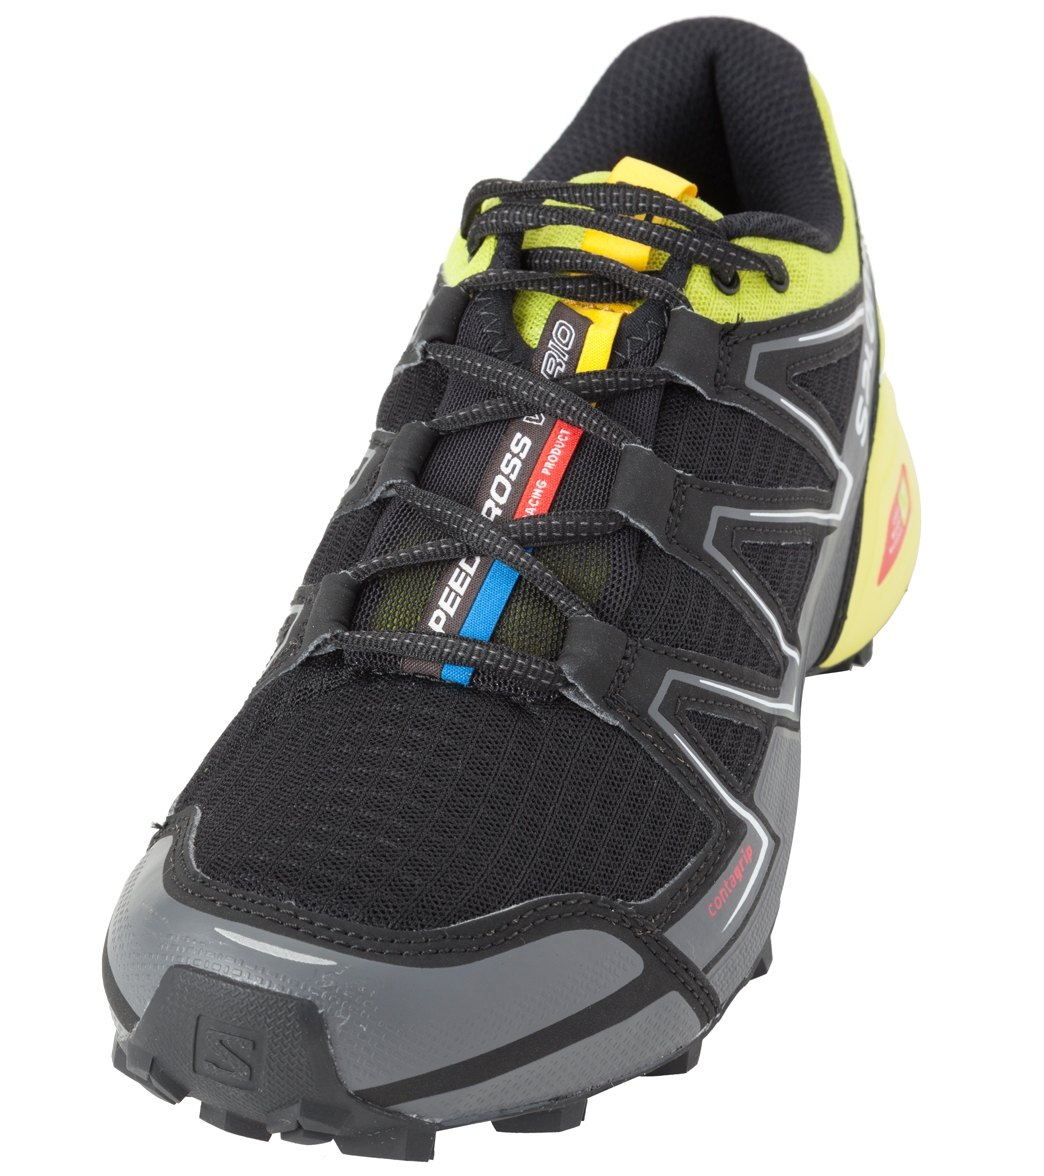 premium selection 115cf 16016 Salomon Men s Speedcross Vario Trail Running Shoes at SwimOutlet.com - Free  Shipping